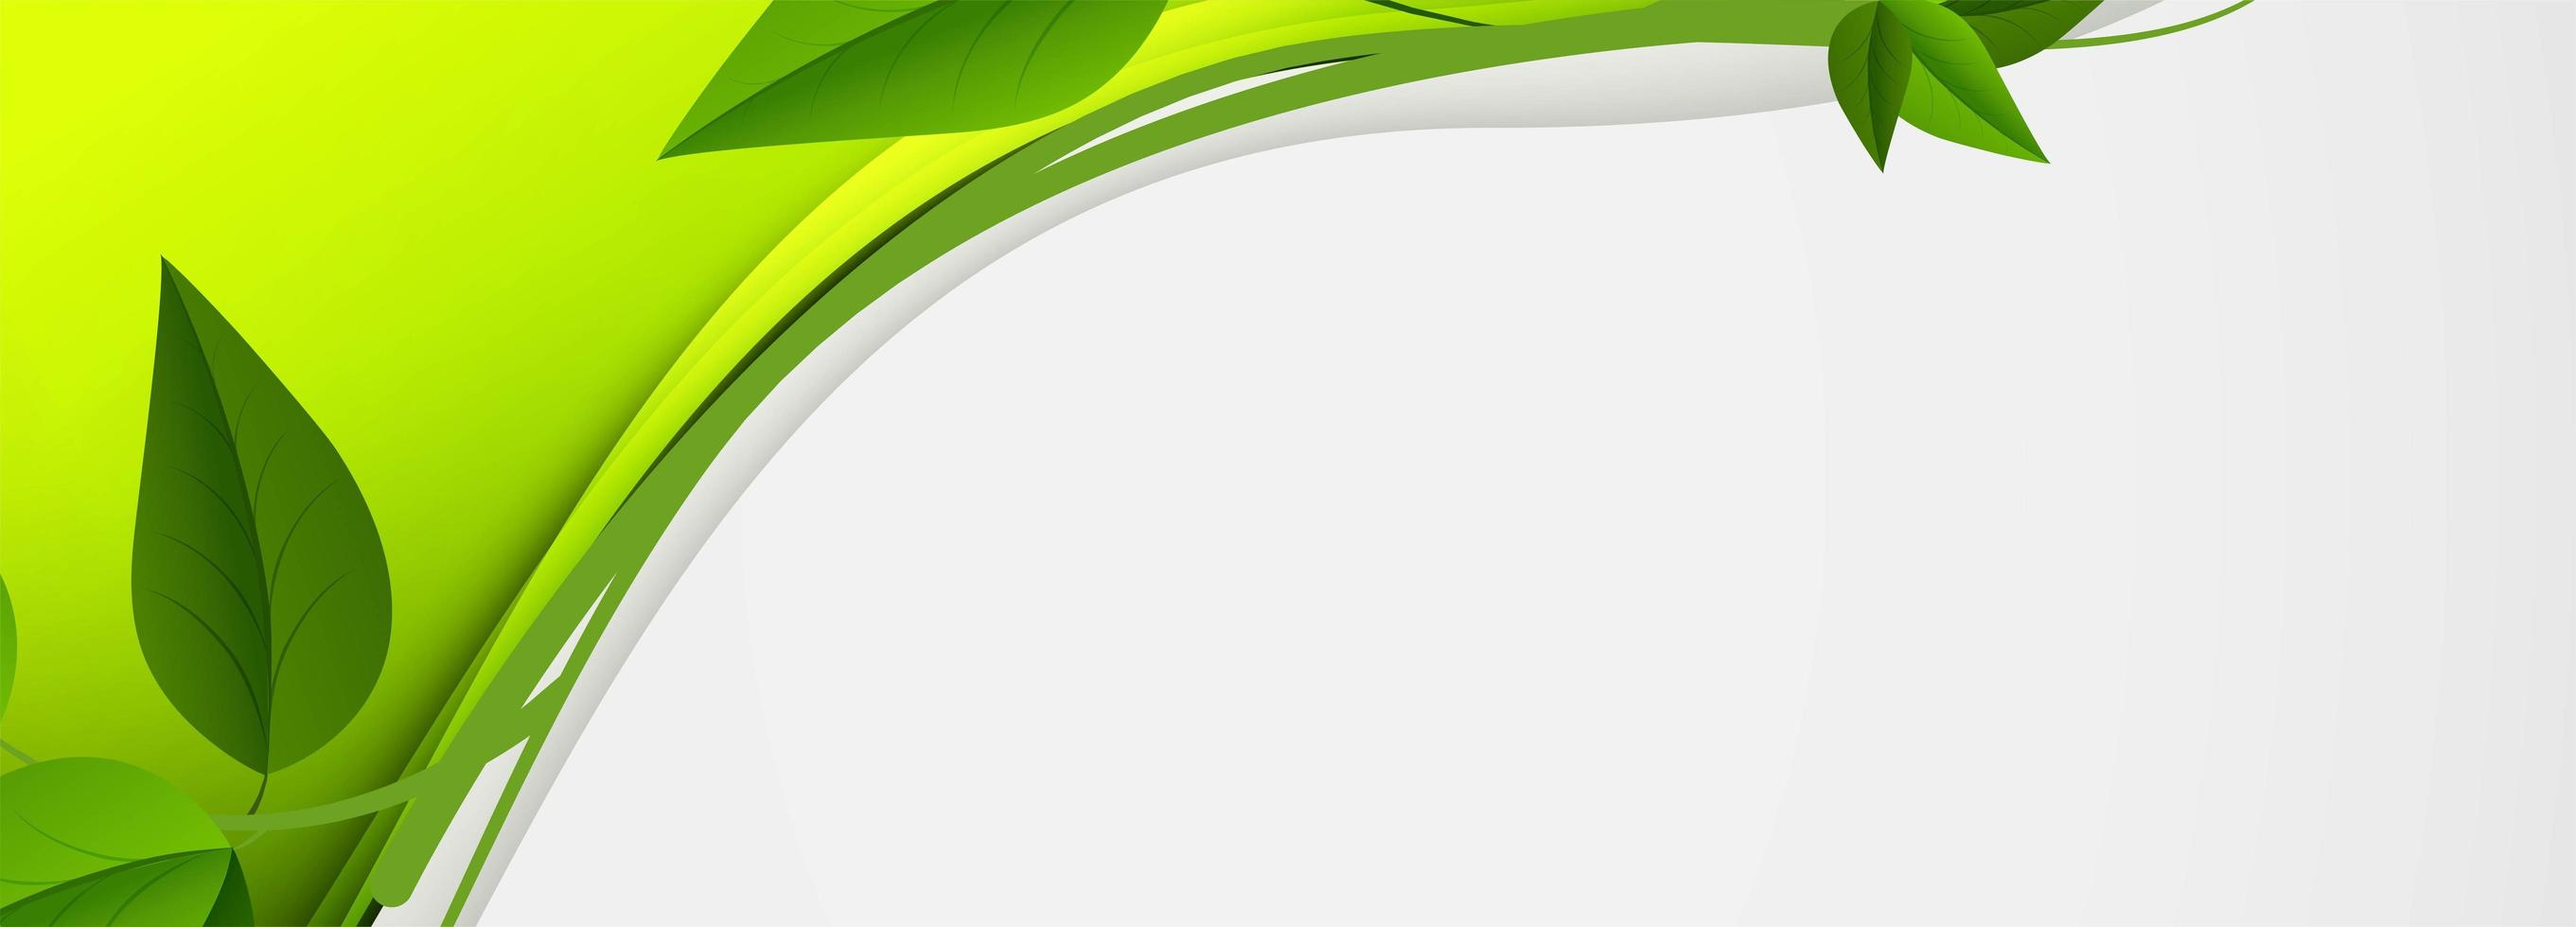 folhas de videira verde abstrata onda banner vetor